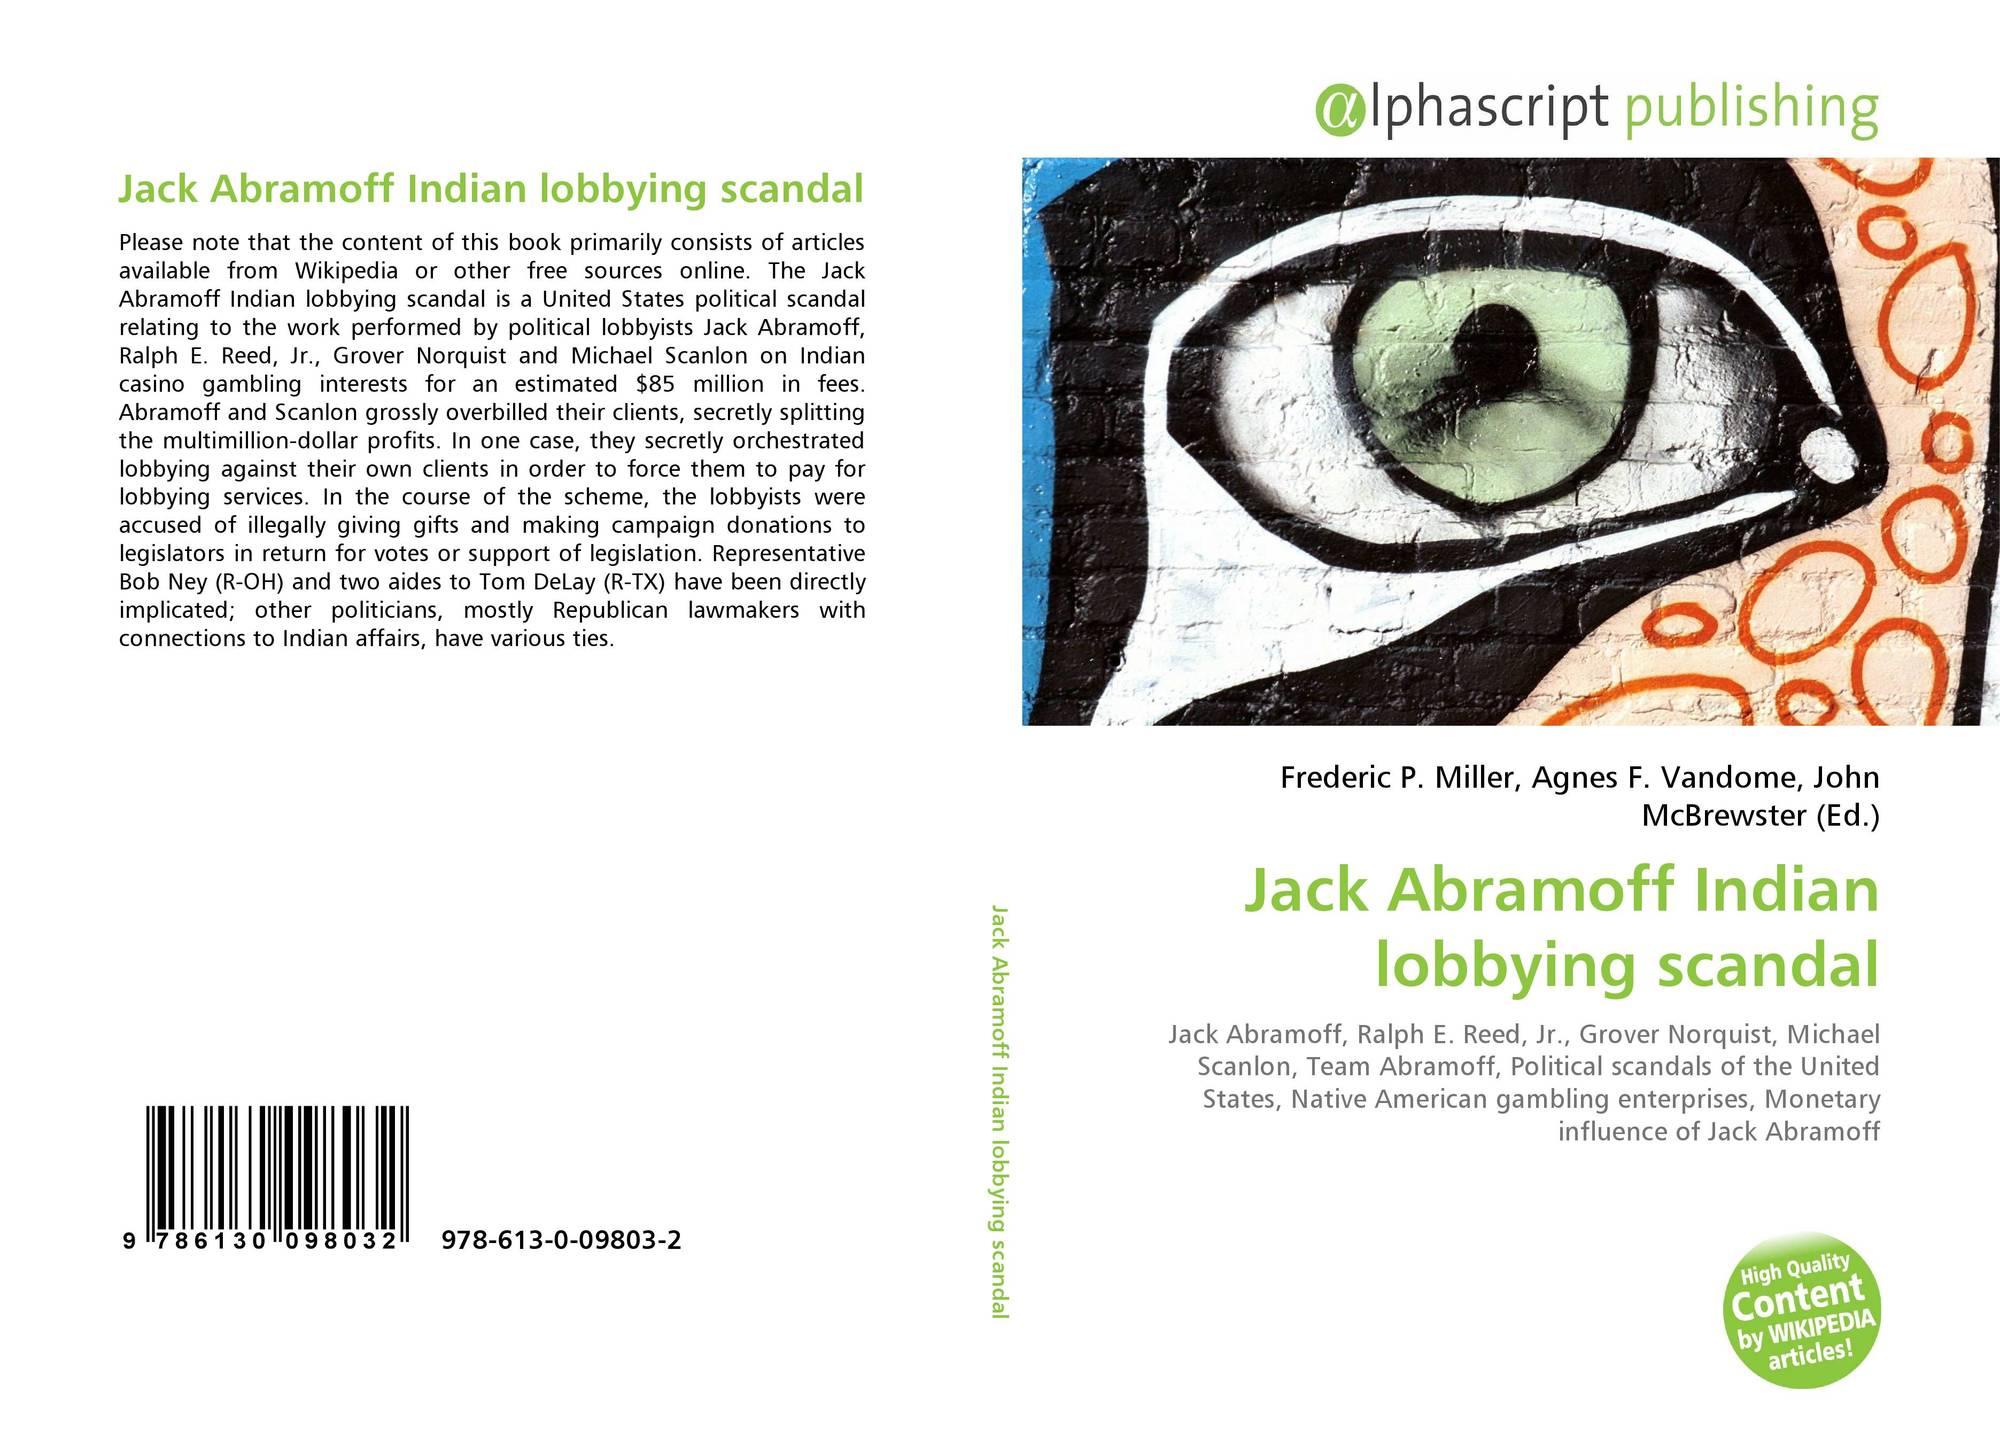 Abramoff indian gambling scandal black casino casino internet jack online yourbestonlinecasino.com